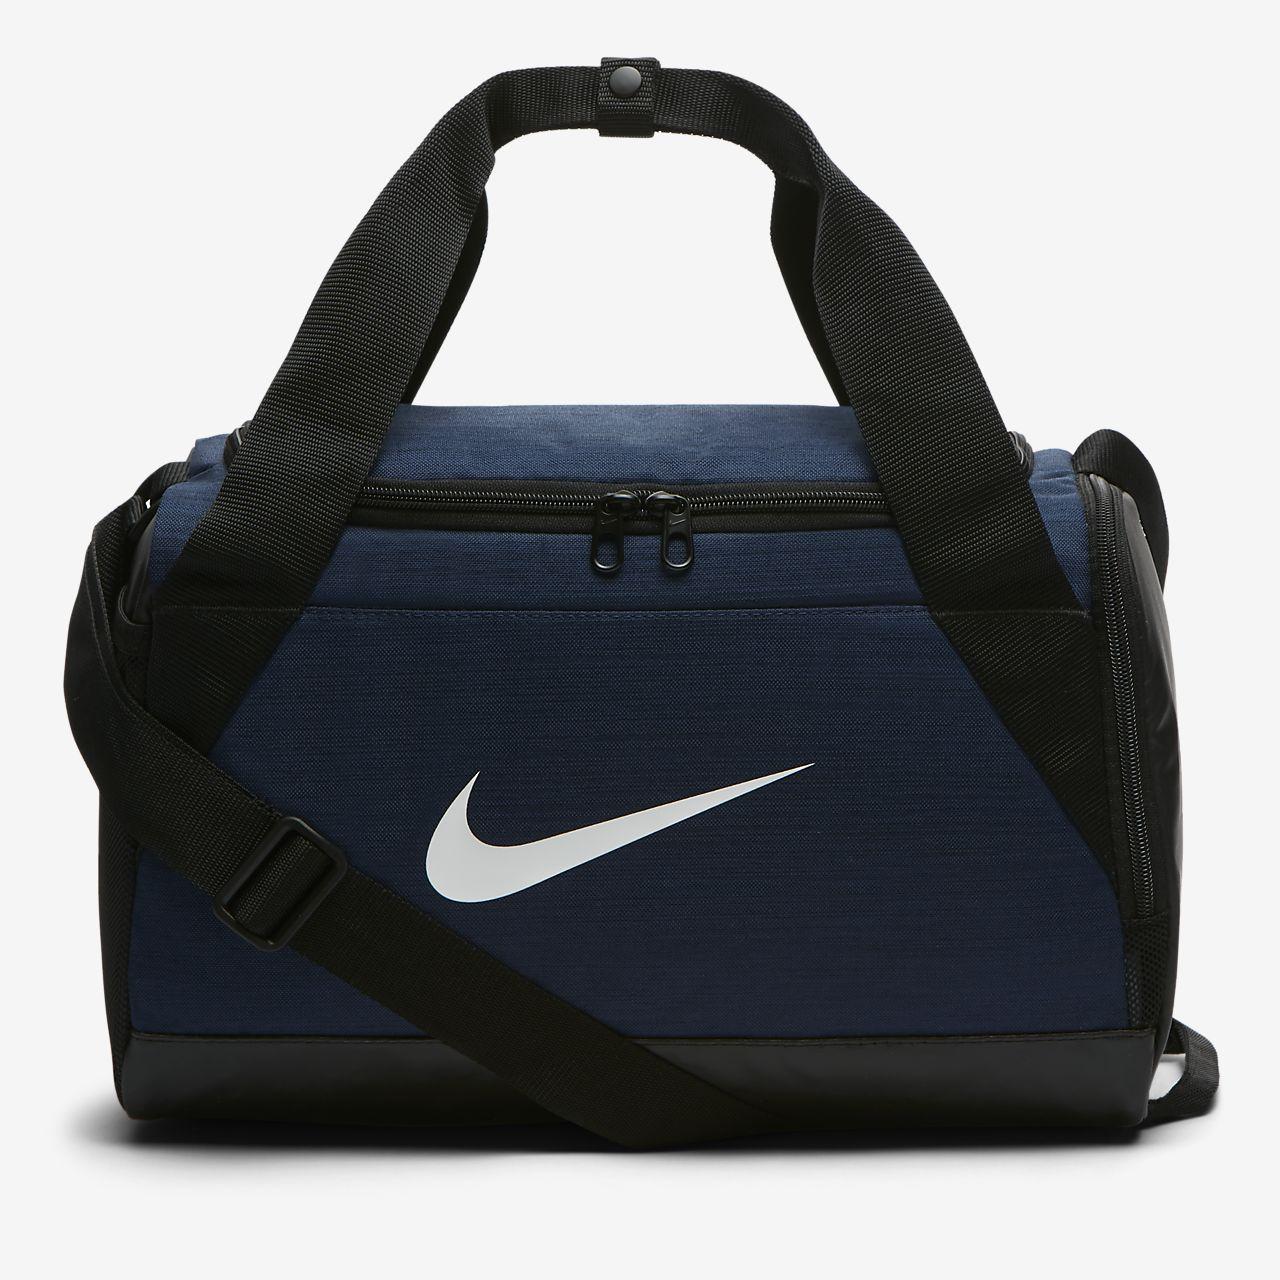 Saco de desporto Nike Brasilia (extra pequeno)